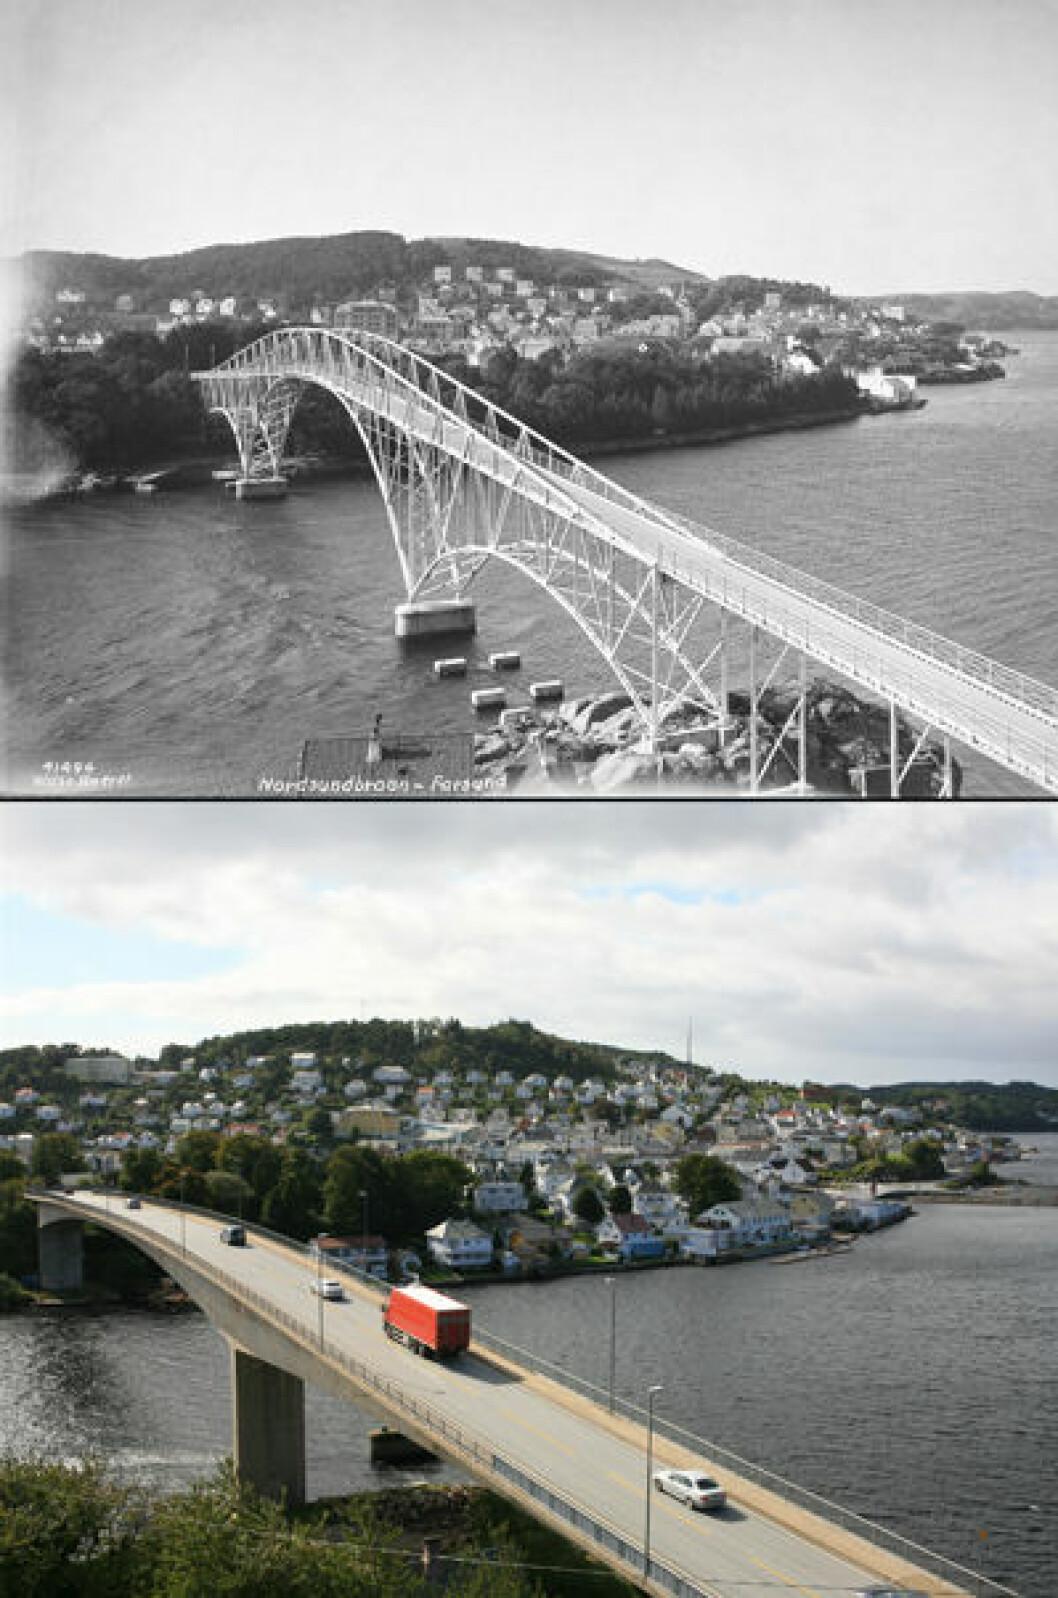 1934 og 2007:Nordsundbrua i Farsund, Vest-Agder. Foto: Anders Beer Wilse/Oscar Puschmann